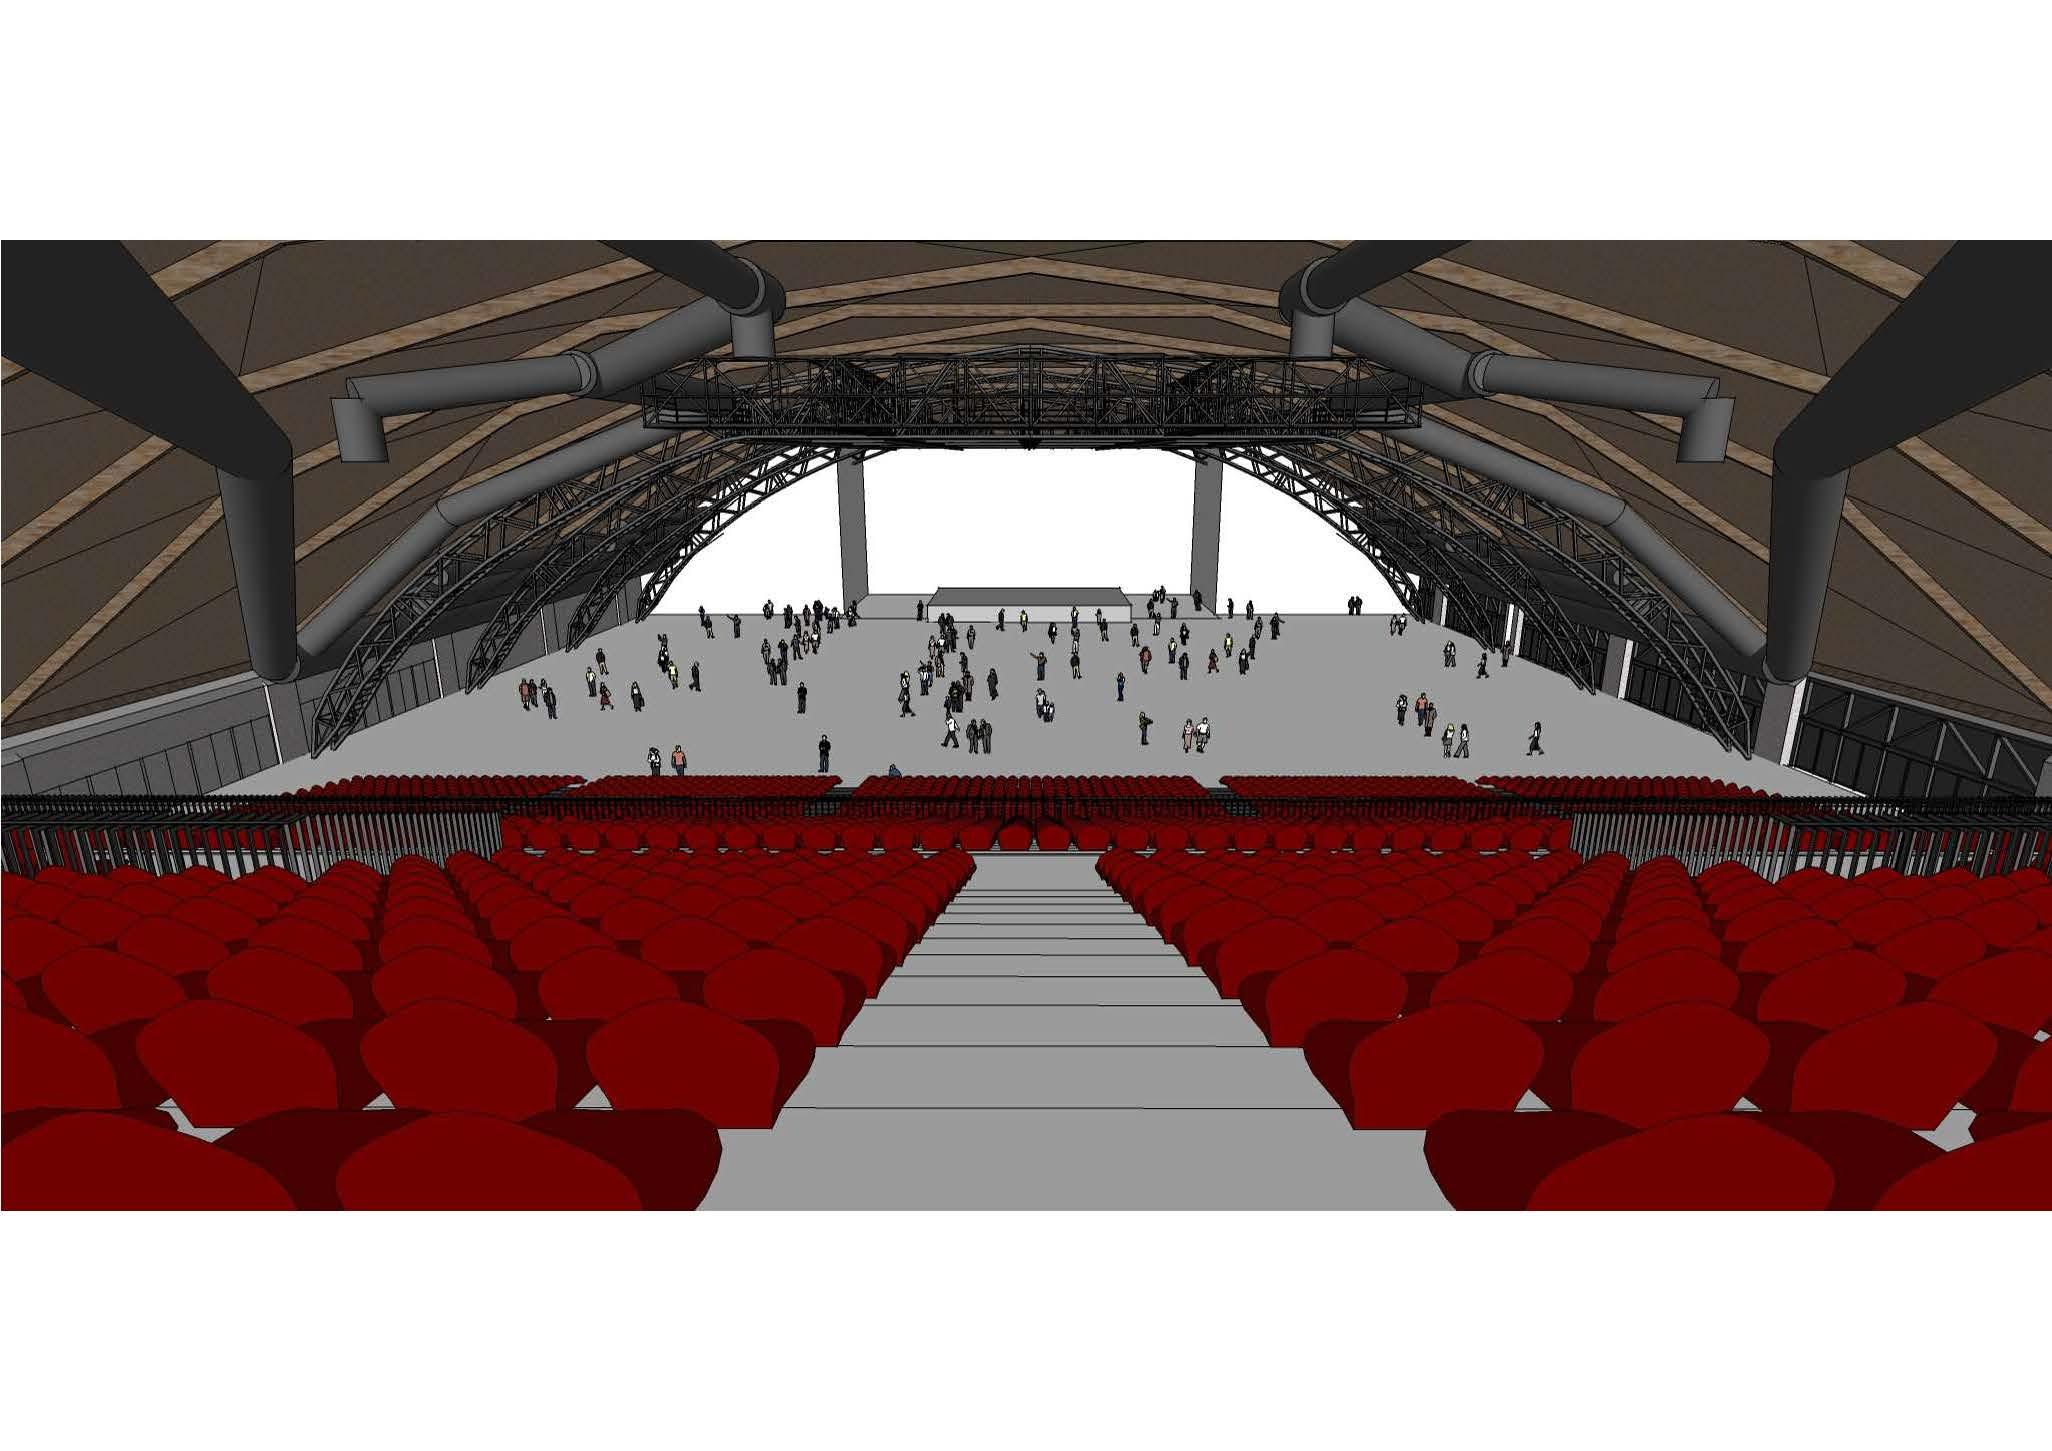 P12 - Images 3D gaines-Structure_2012.08.21_Page_2